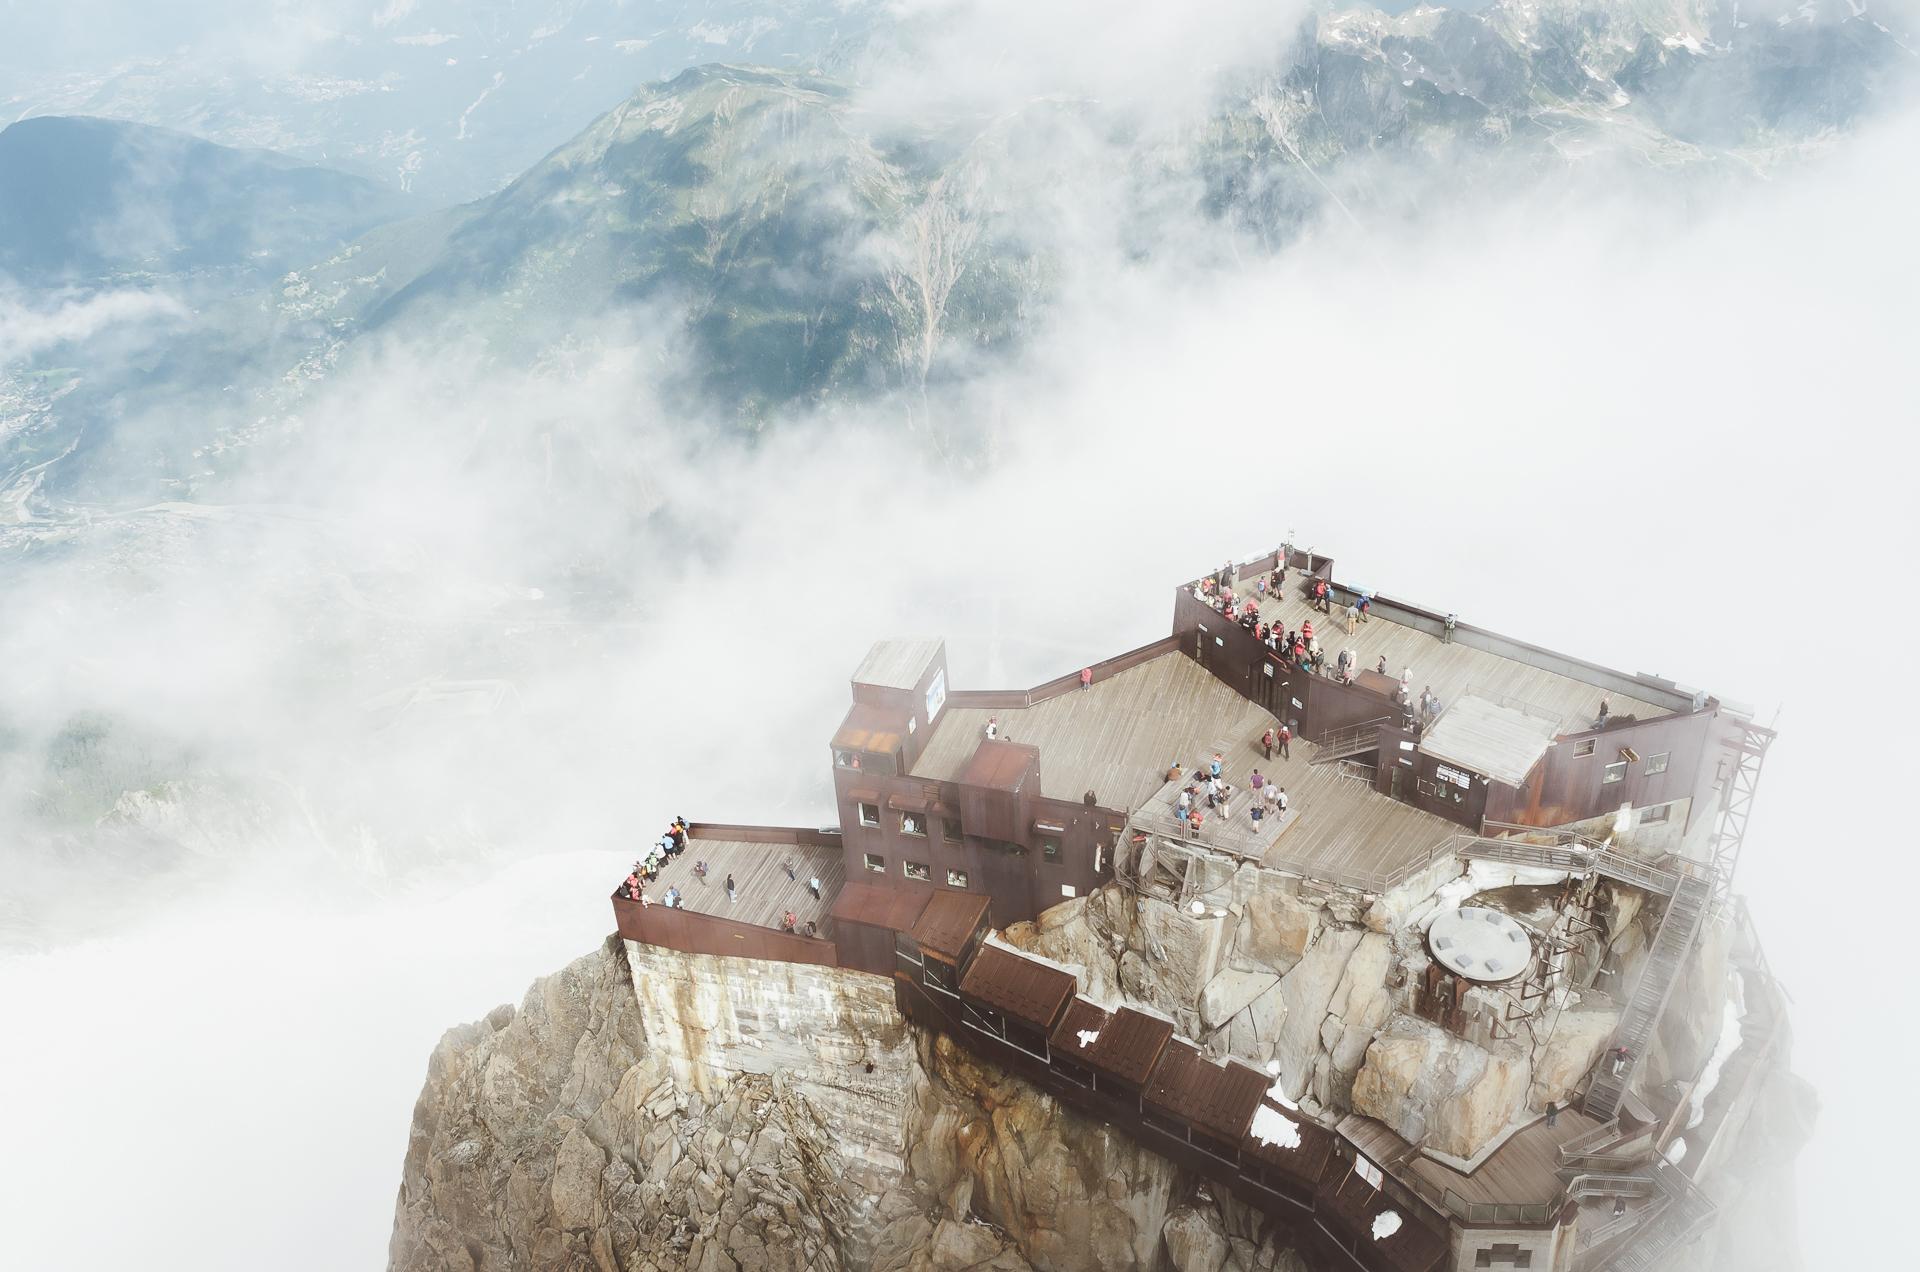 Chamonix, Aiguille de Midi, Alps